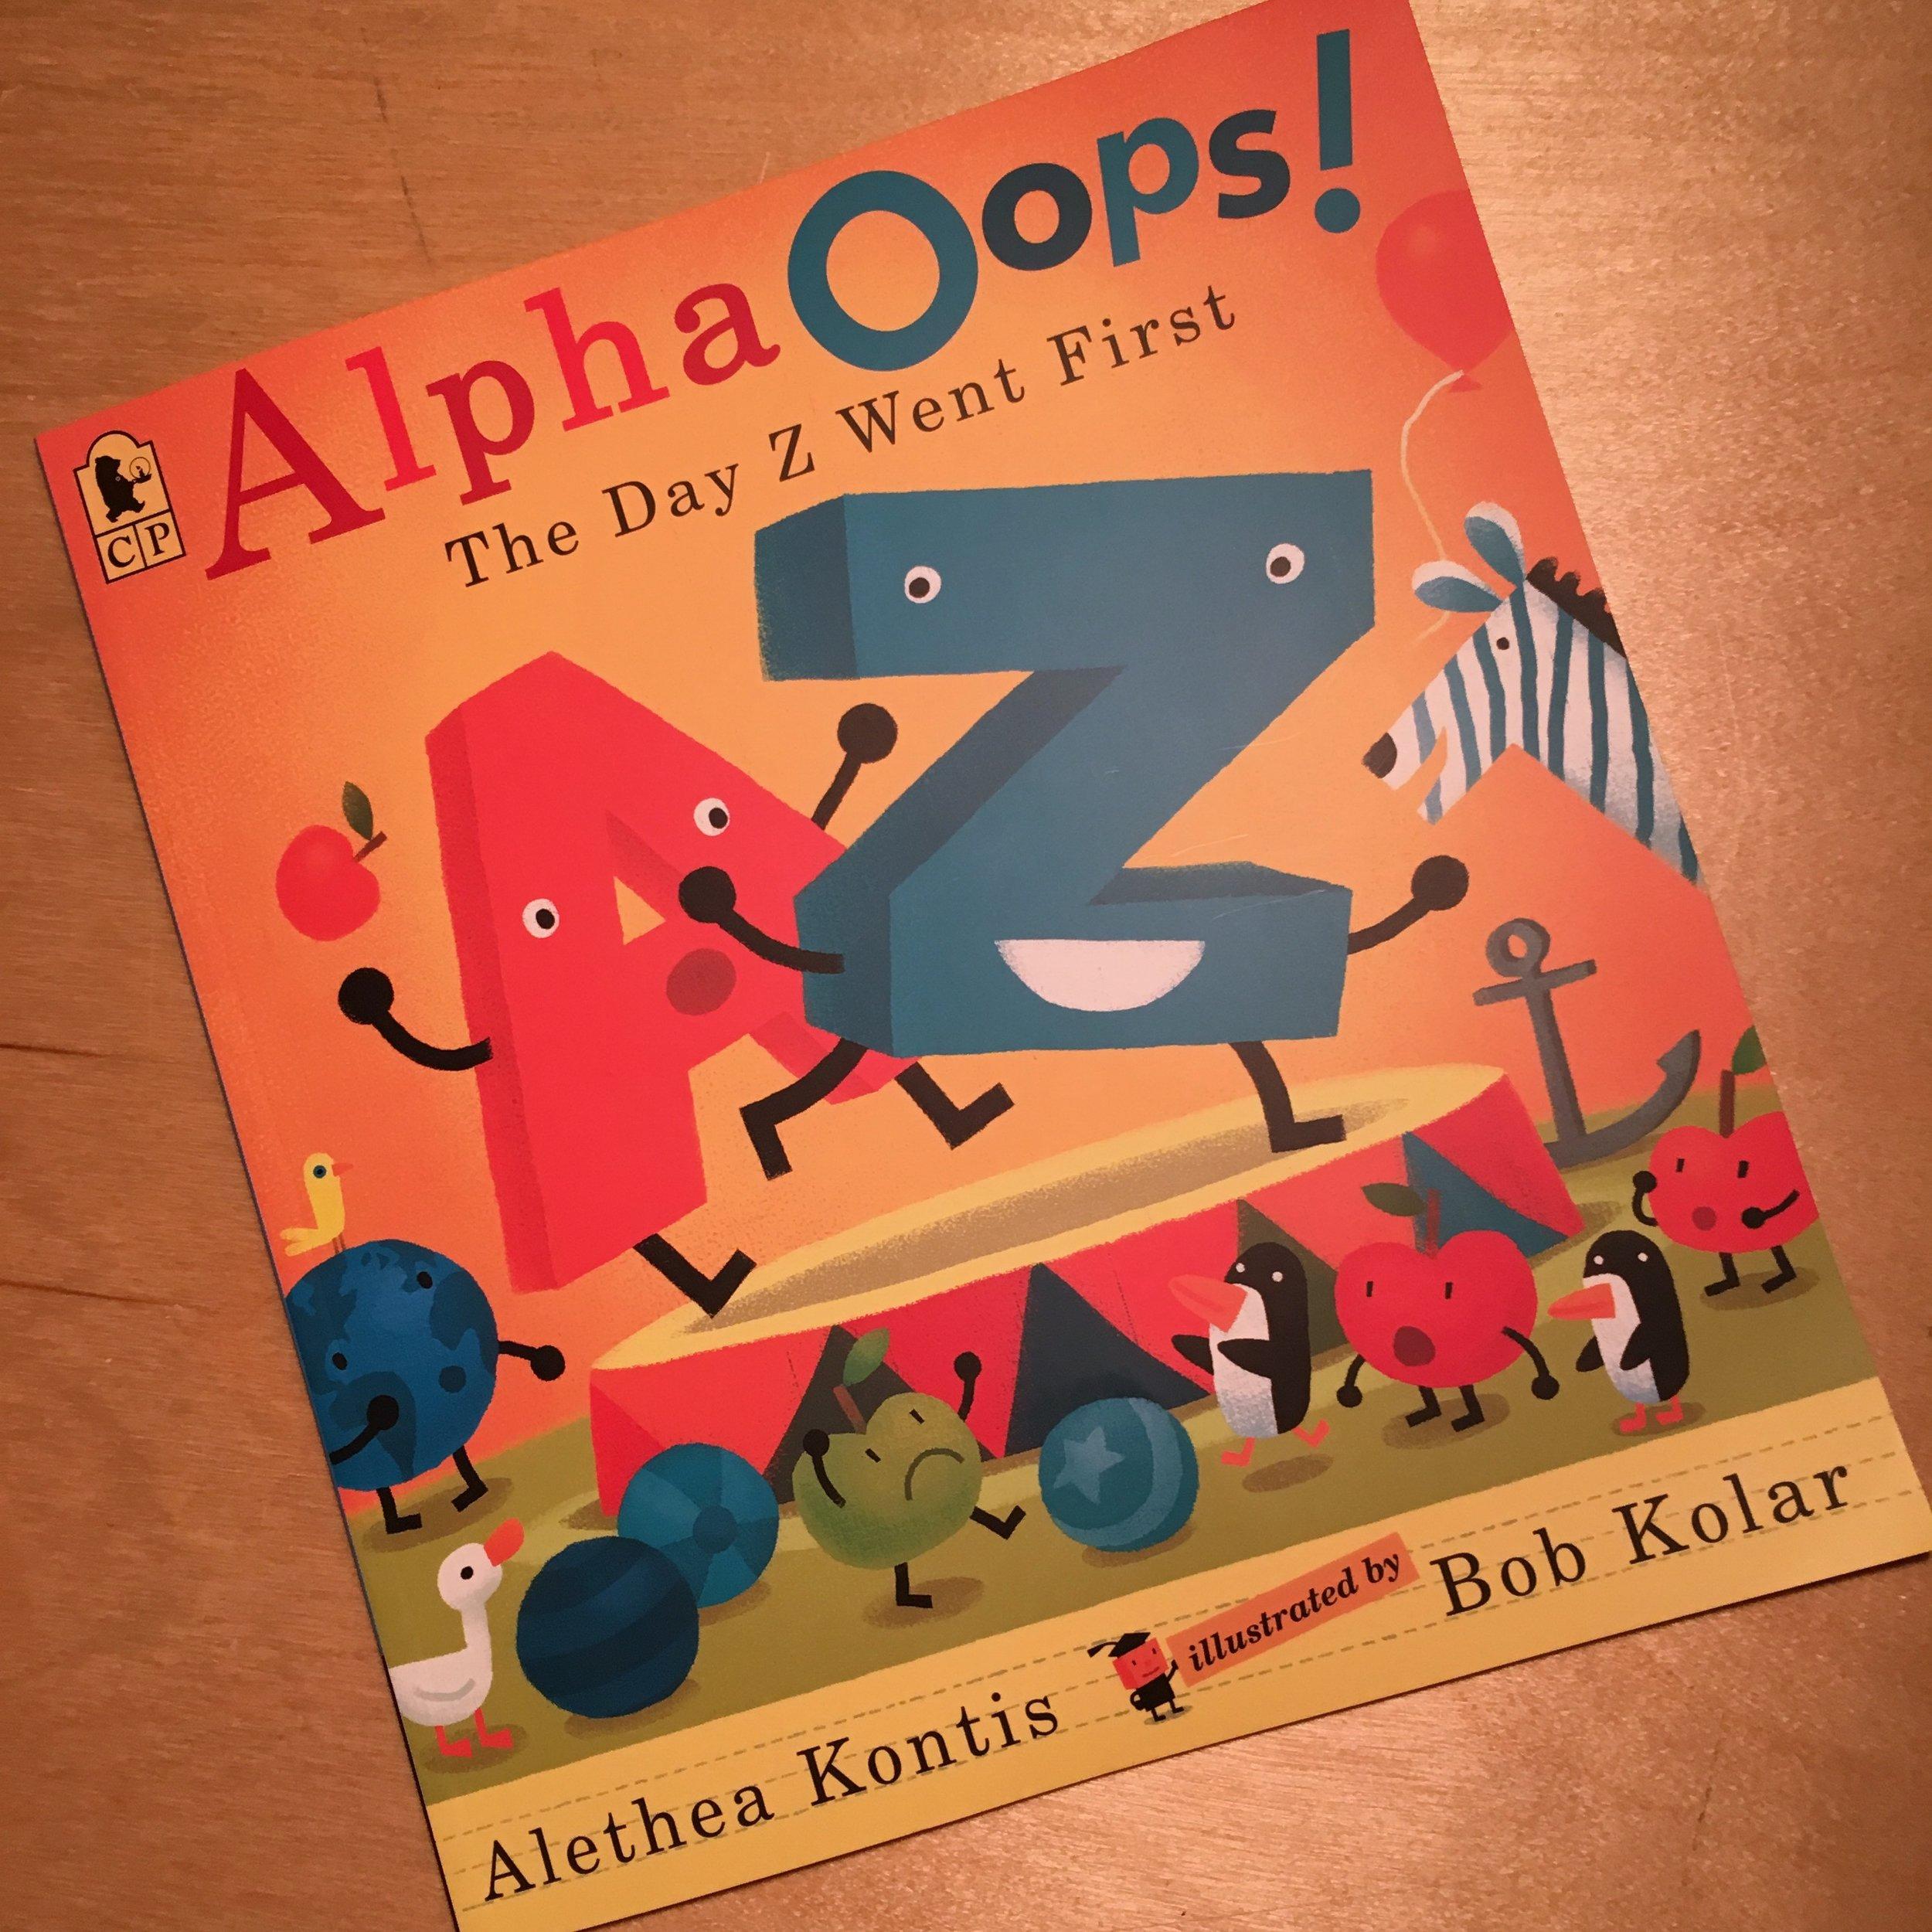 Alpha-Oops just had it's 7th reprint.